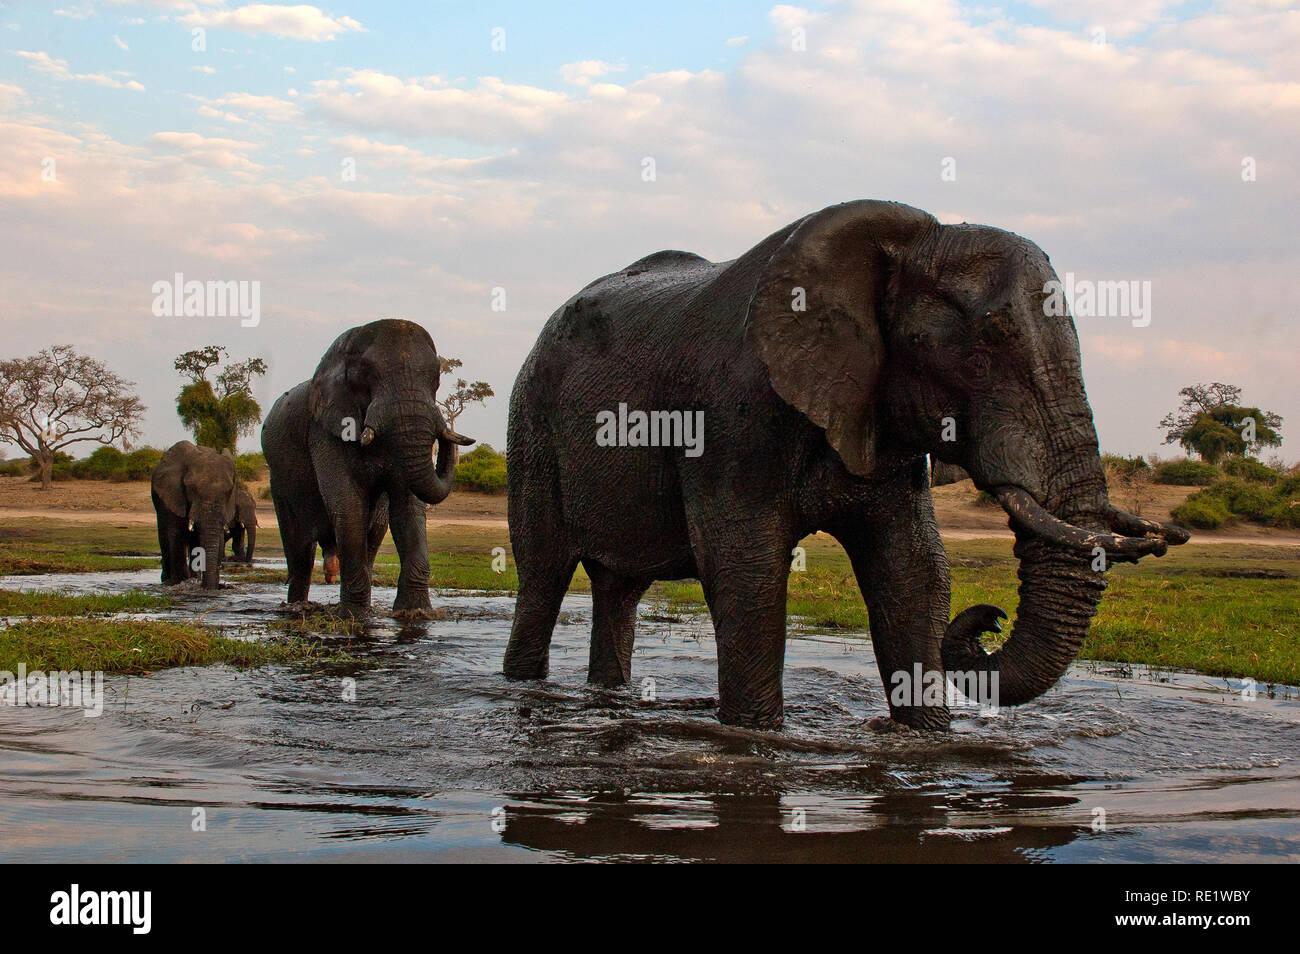 Elephants crossing Chobe River, Chobe National Park, Botswana - Stock Image